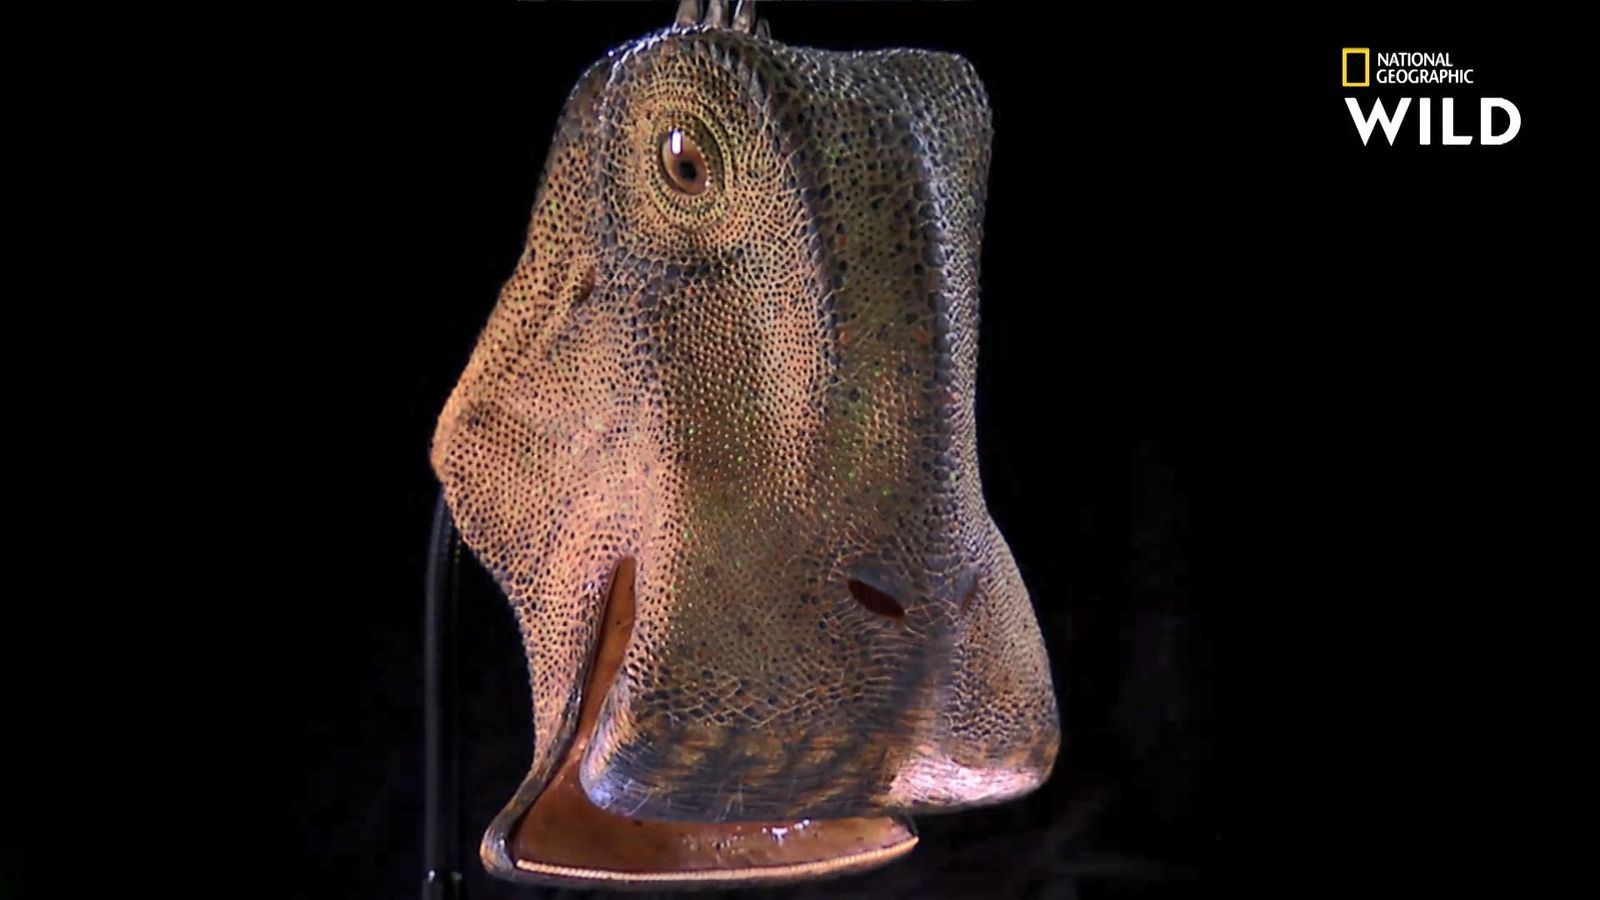 Le Nigersaurus, grand consommateur d'herbe